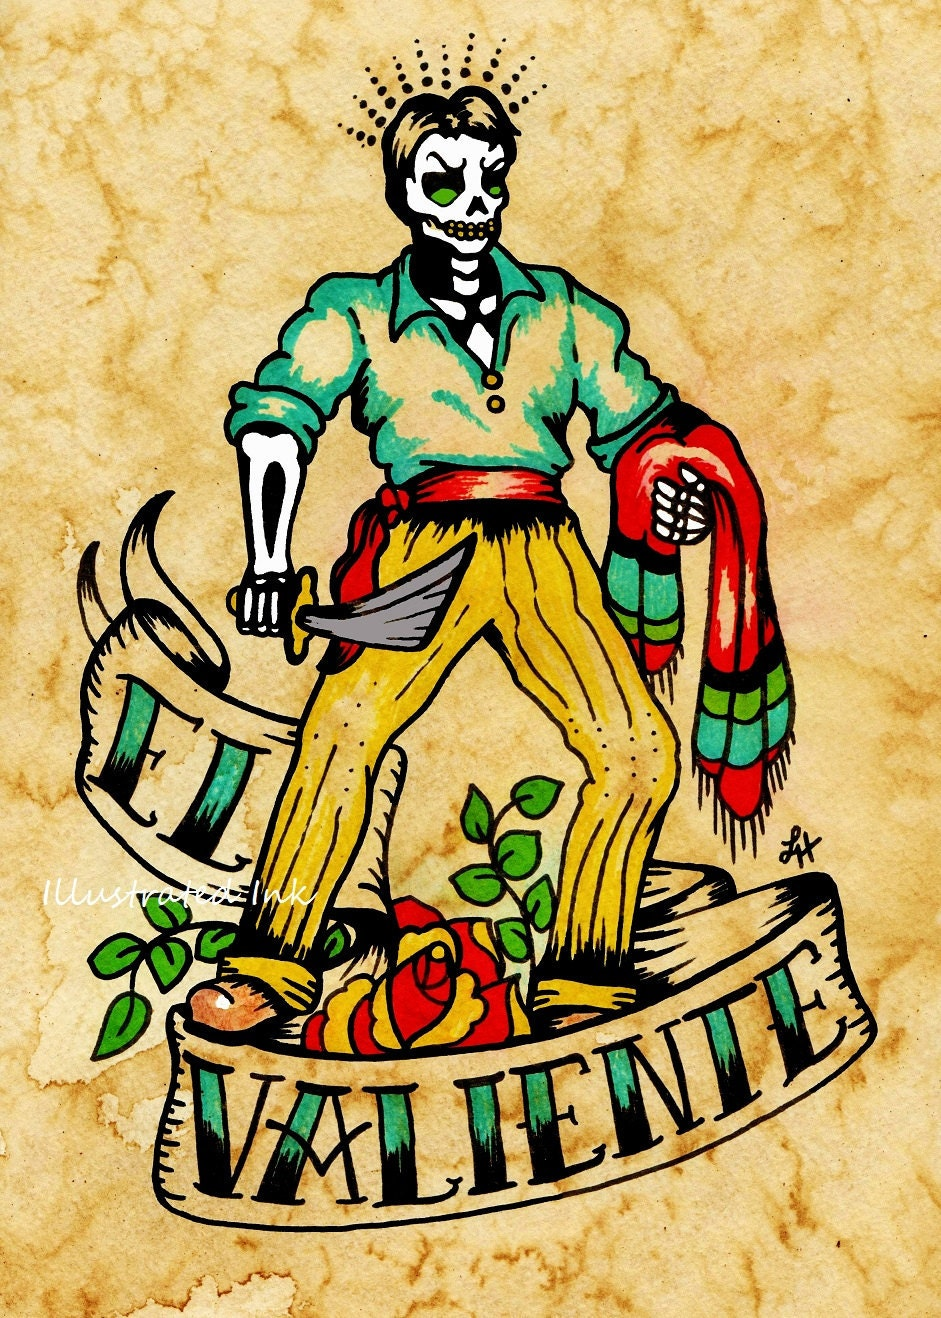 Day of the Dead Tattoo Art EL VALIENTE Loteria Print 5 x 7 8